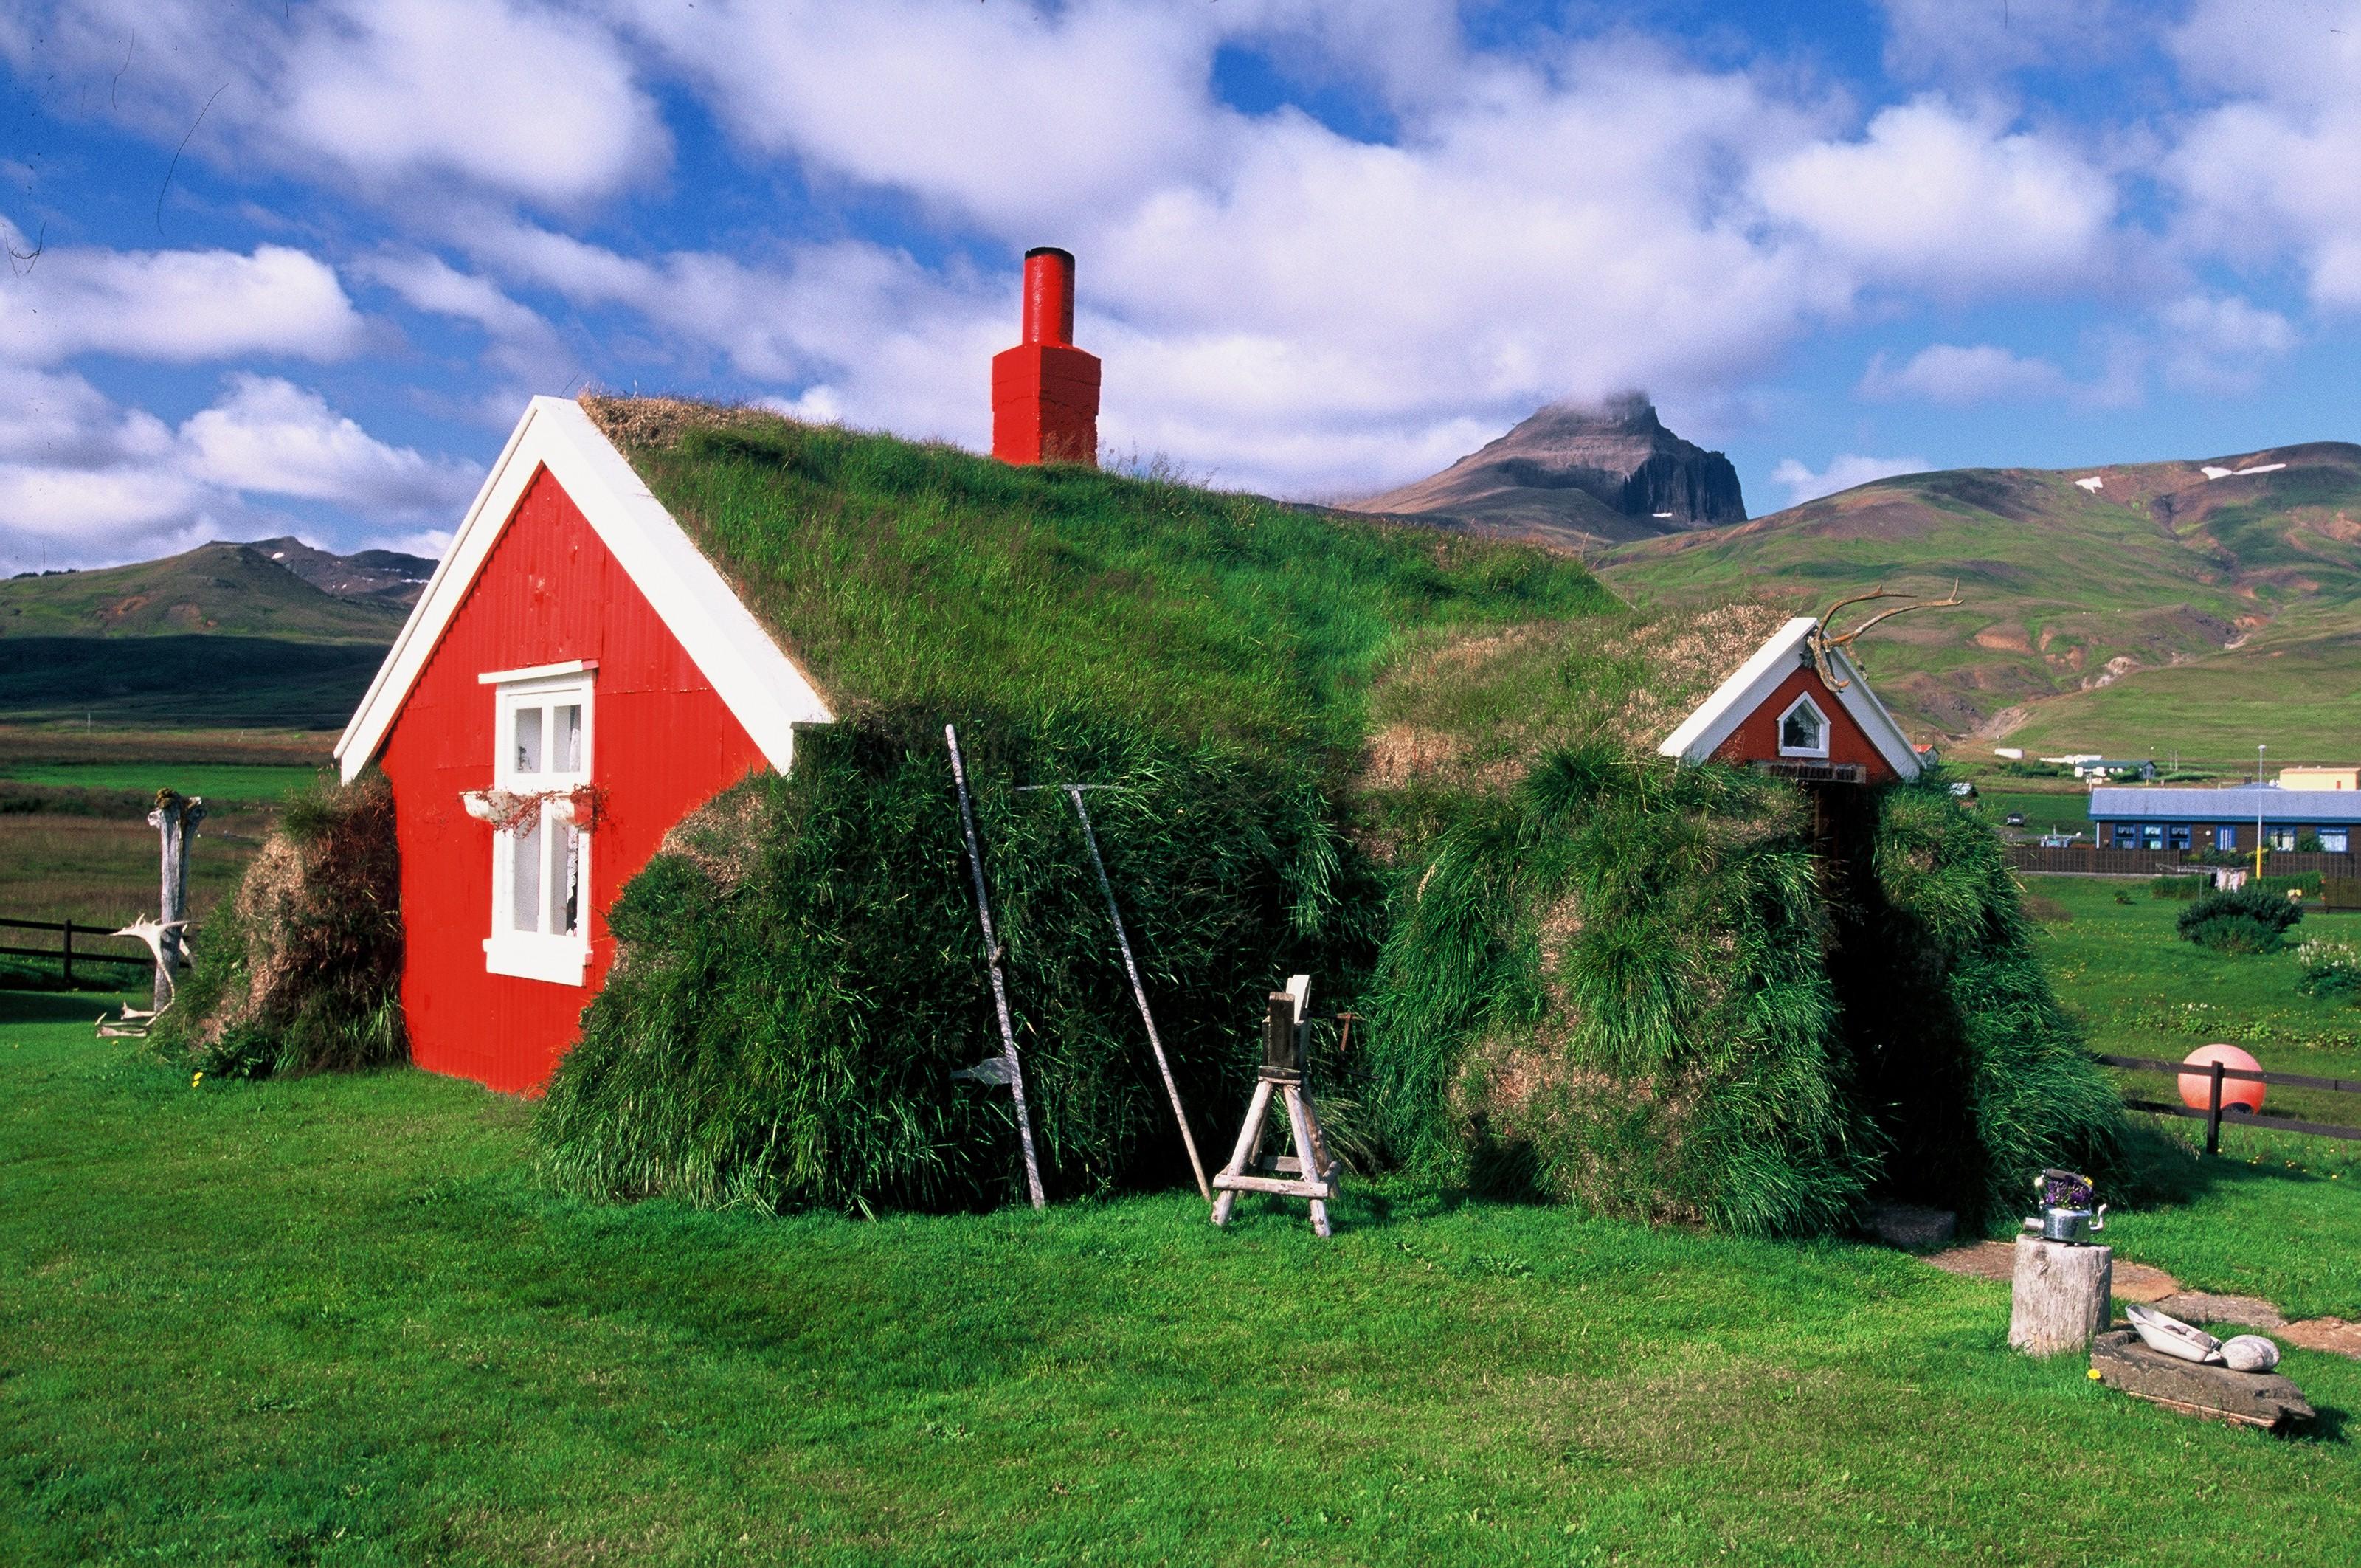 A turf house in Borgarfjörður Eystri, Iceland.